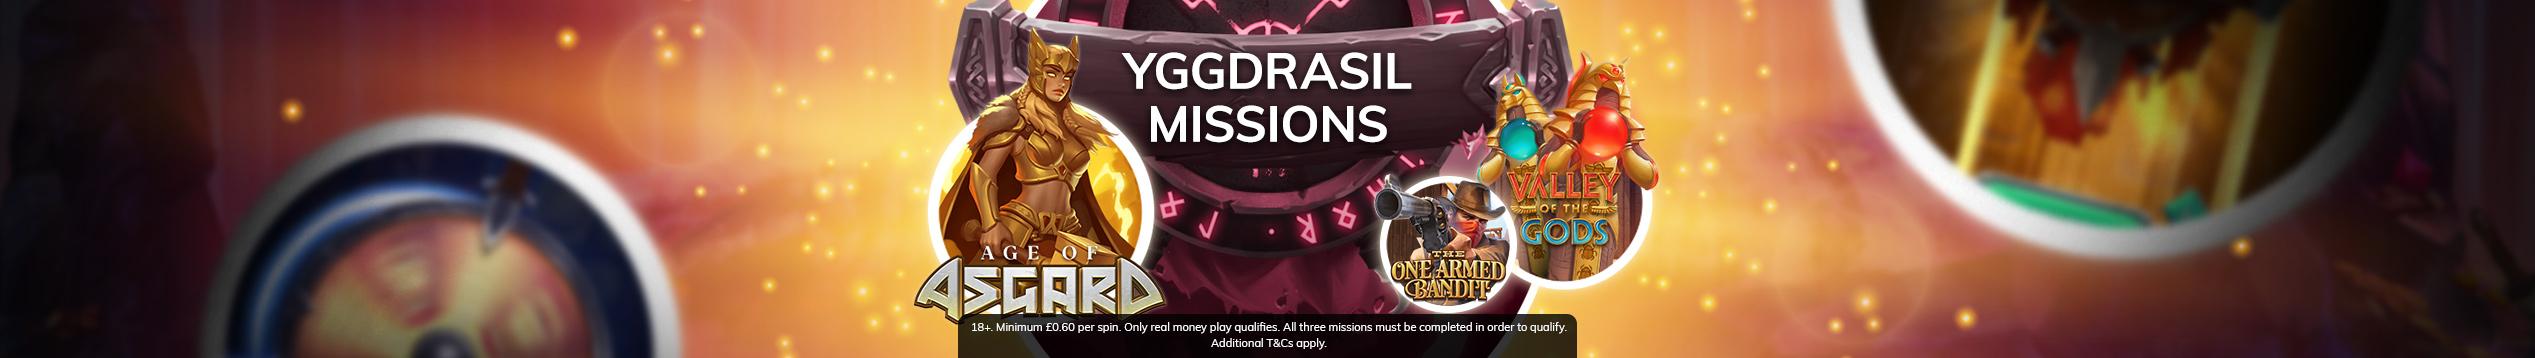 Yggdrasil Missions!